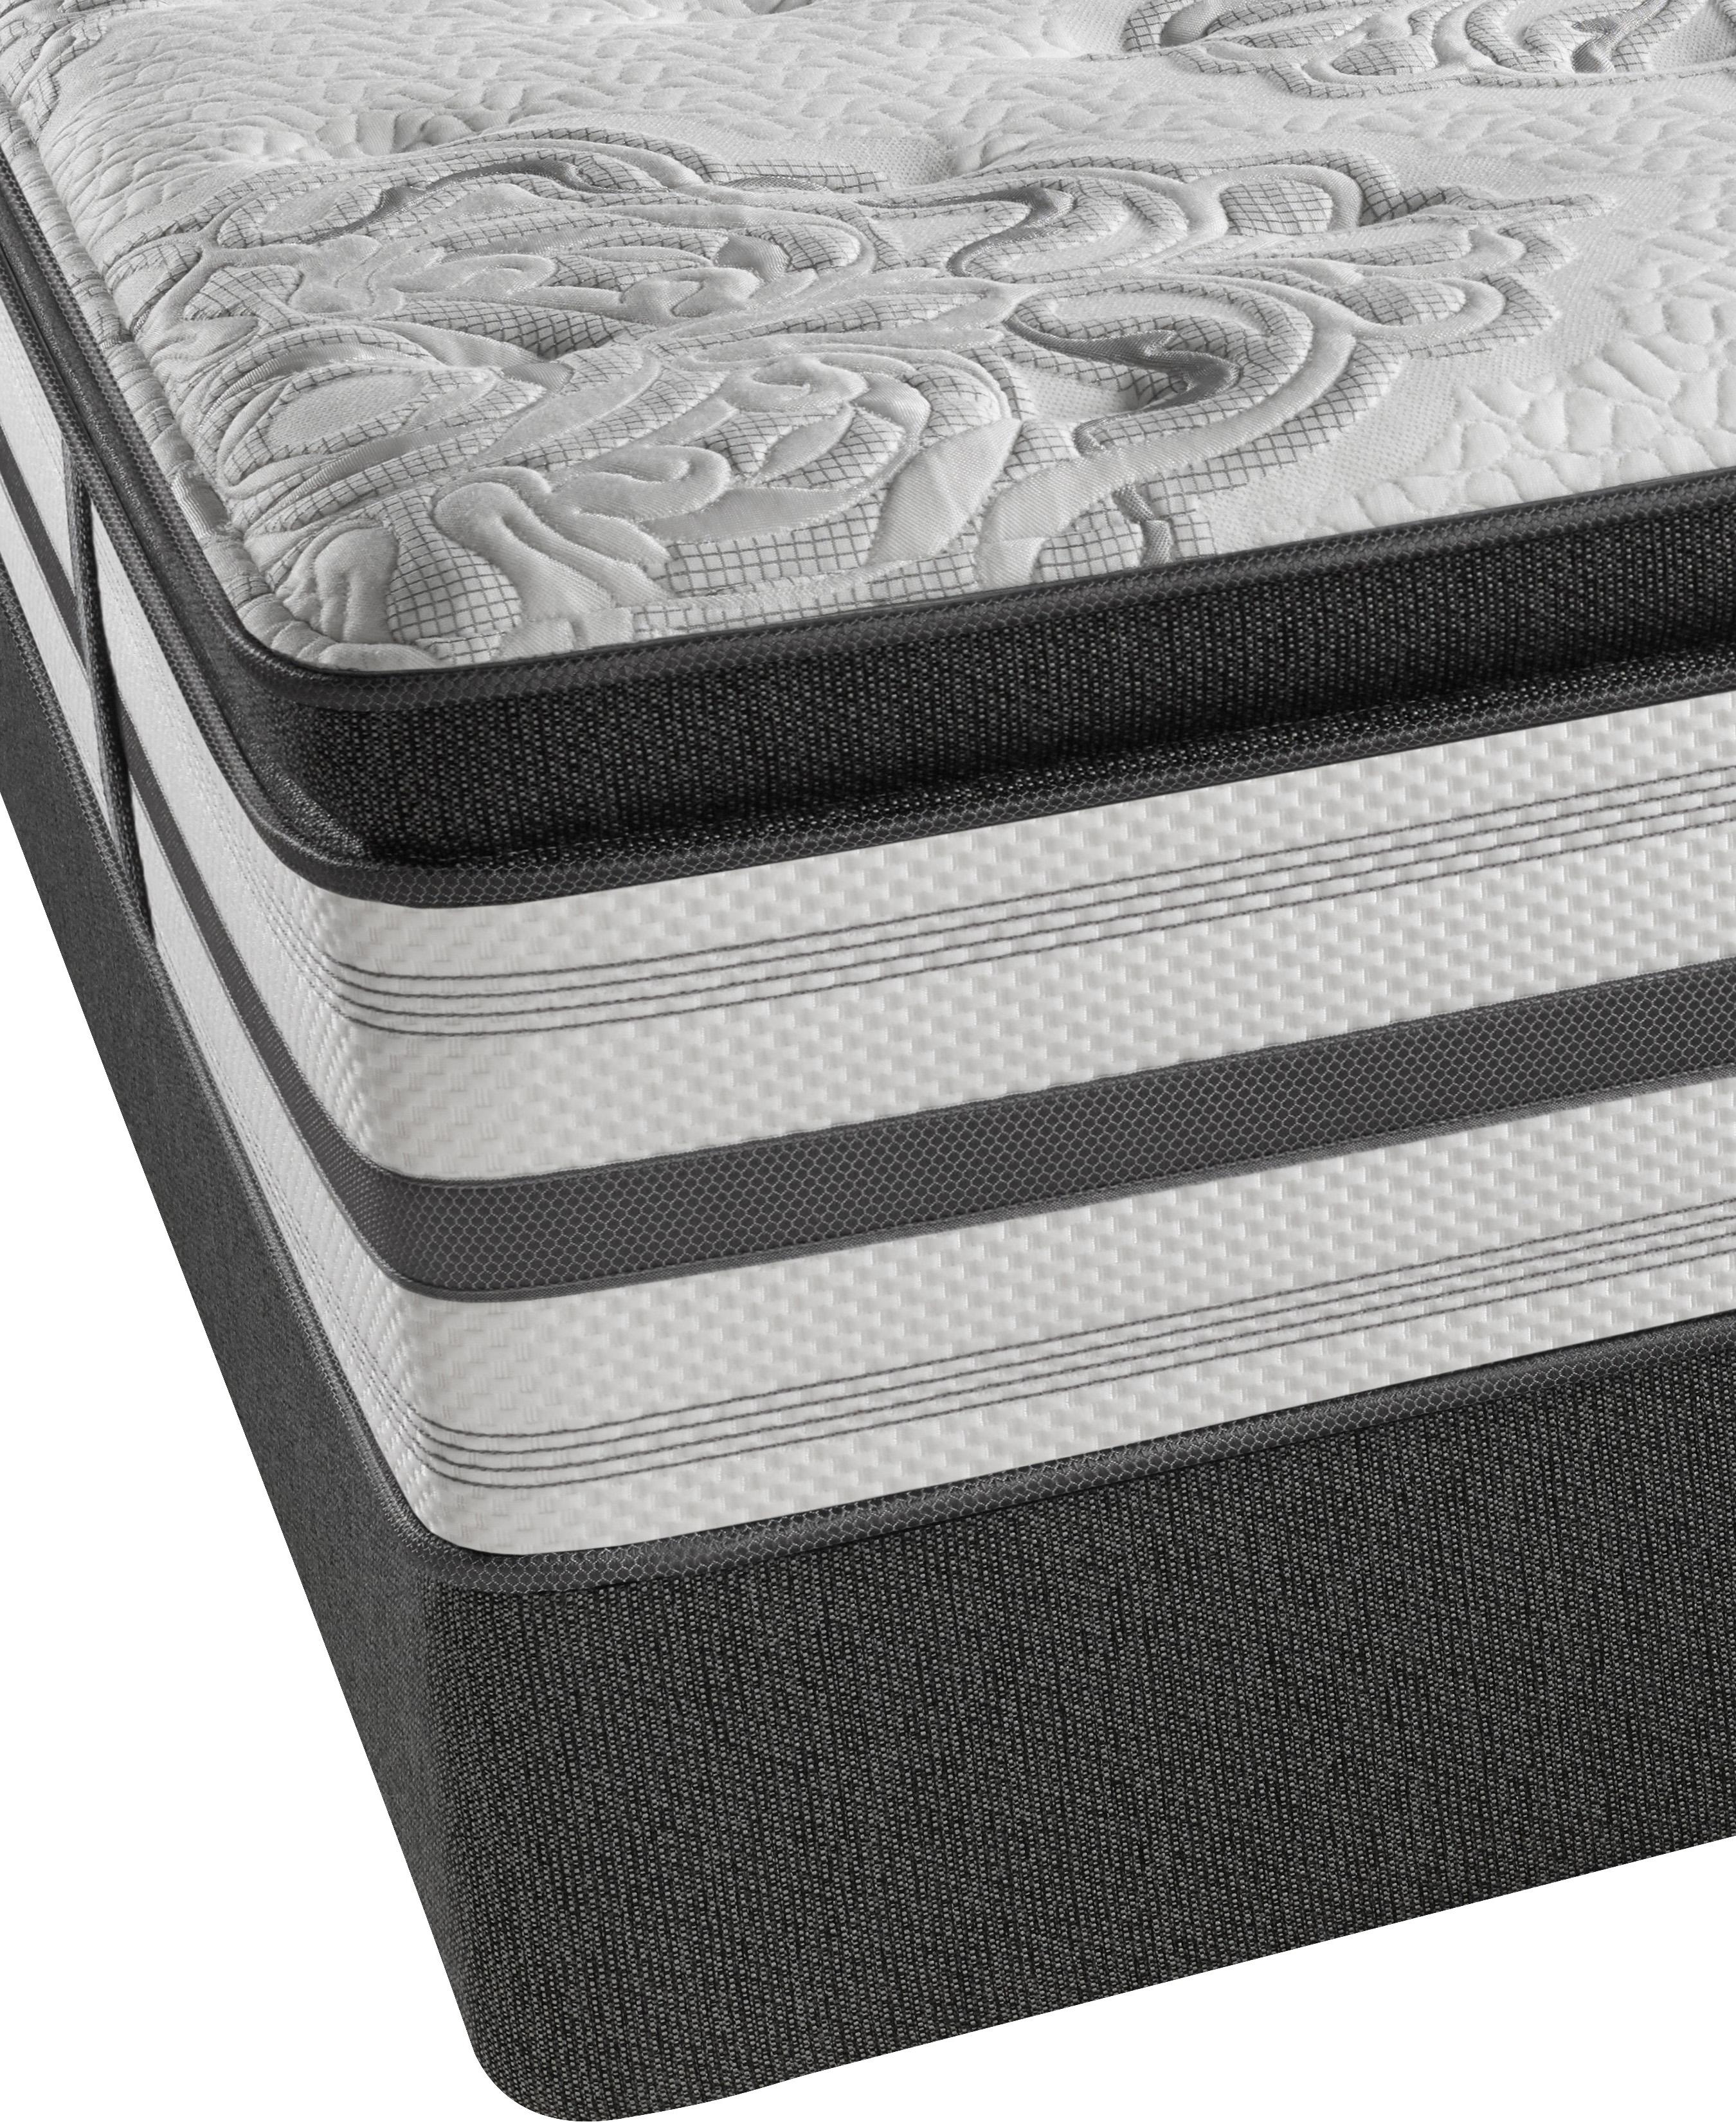 Beautyrest Platinum Hailey Luxury Firm Queen Mattress